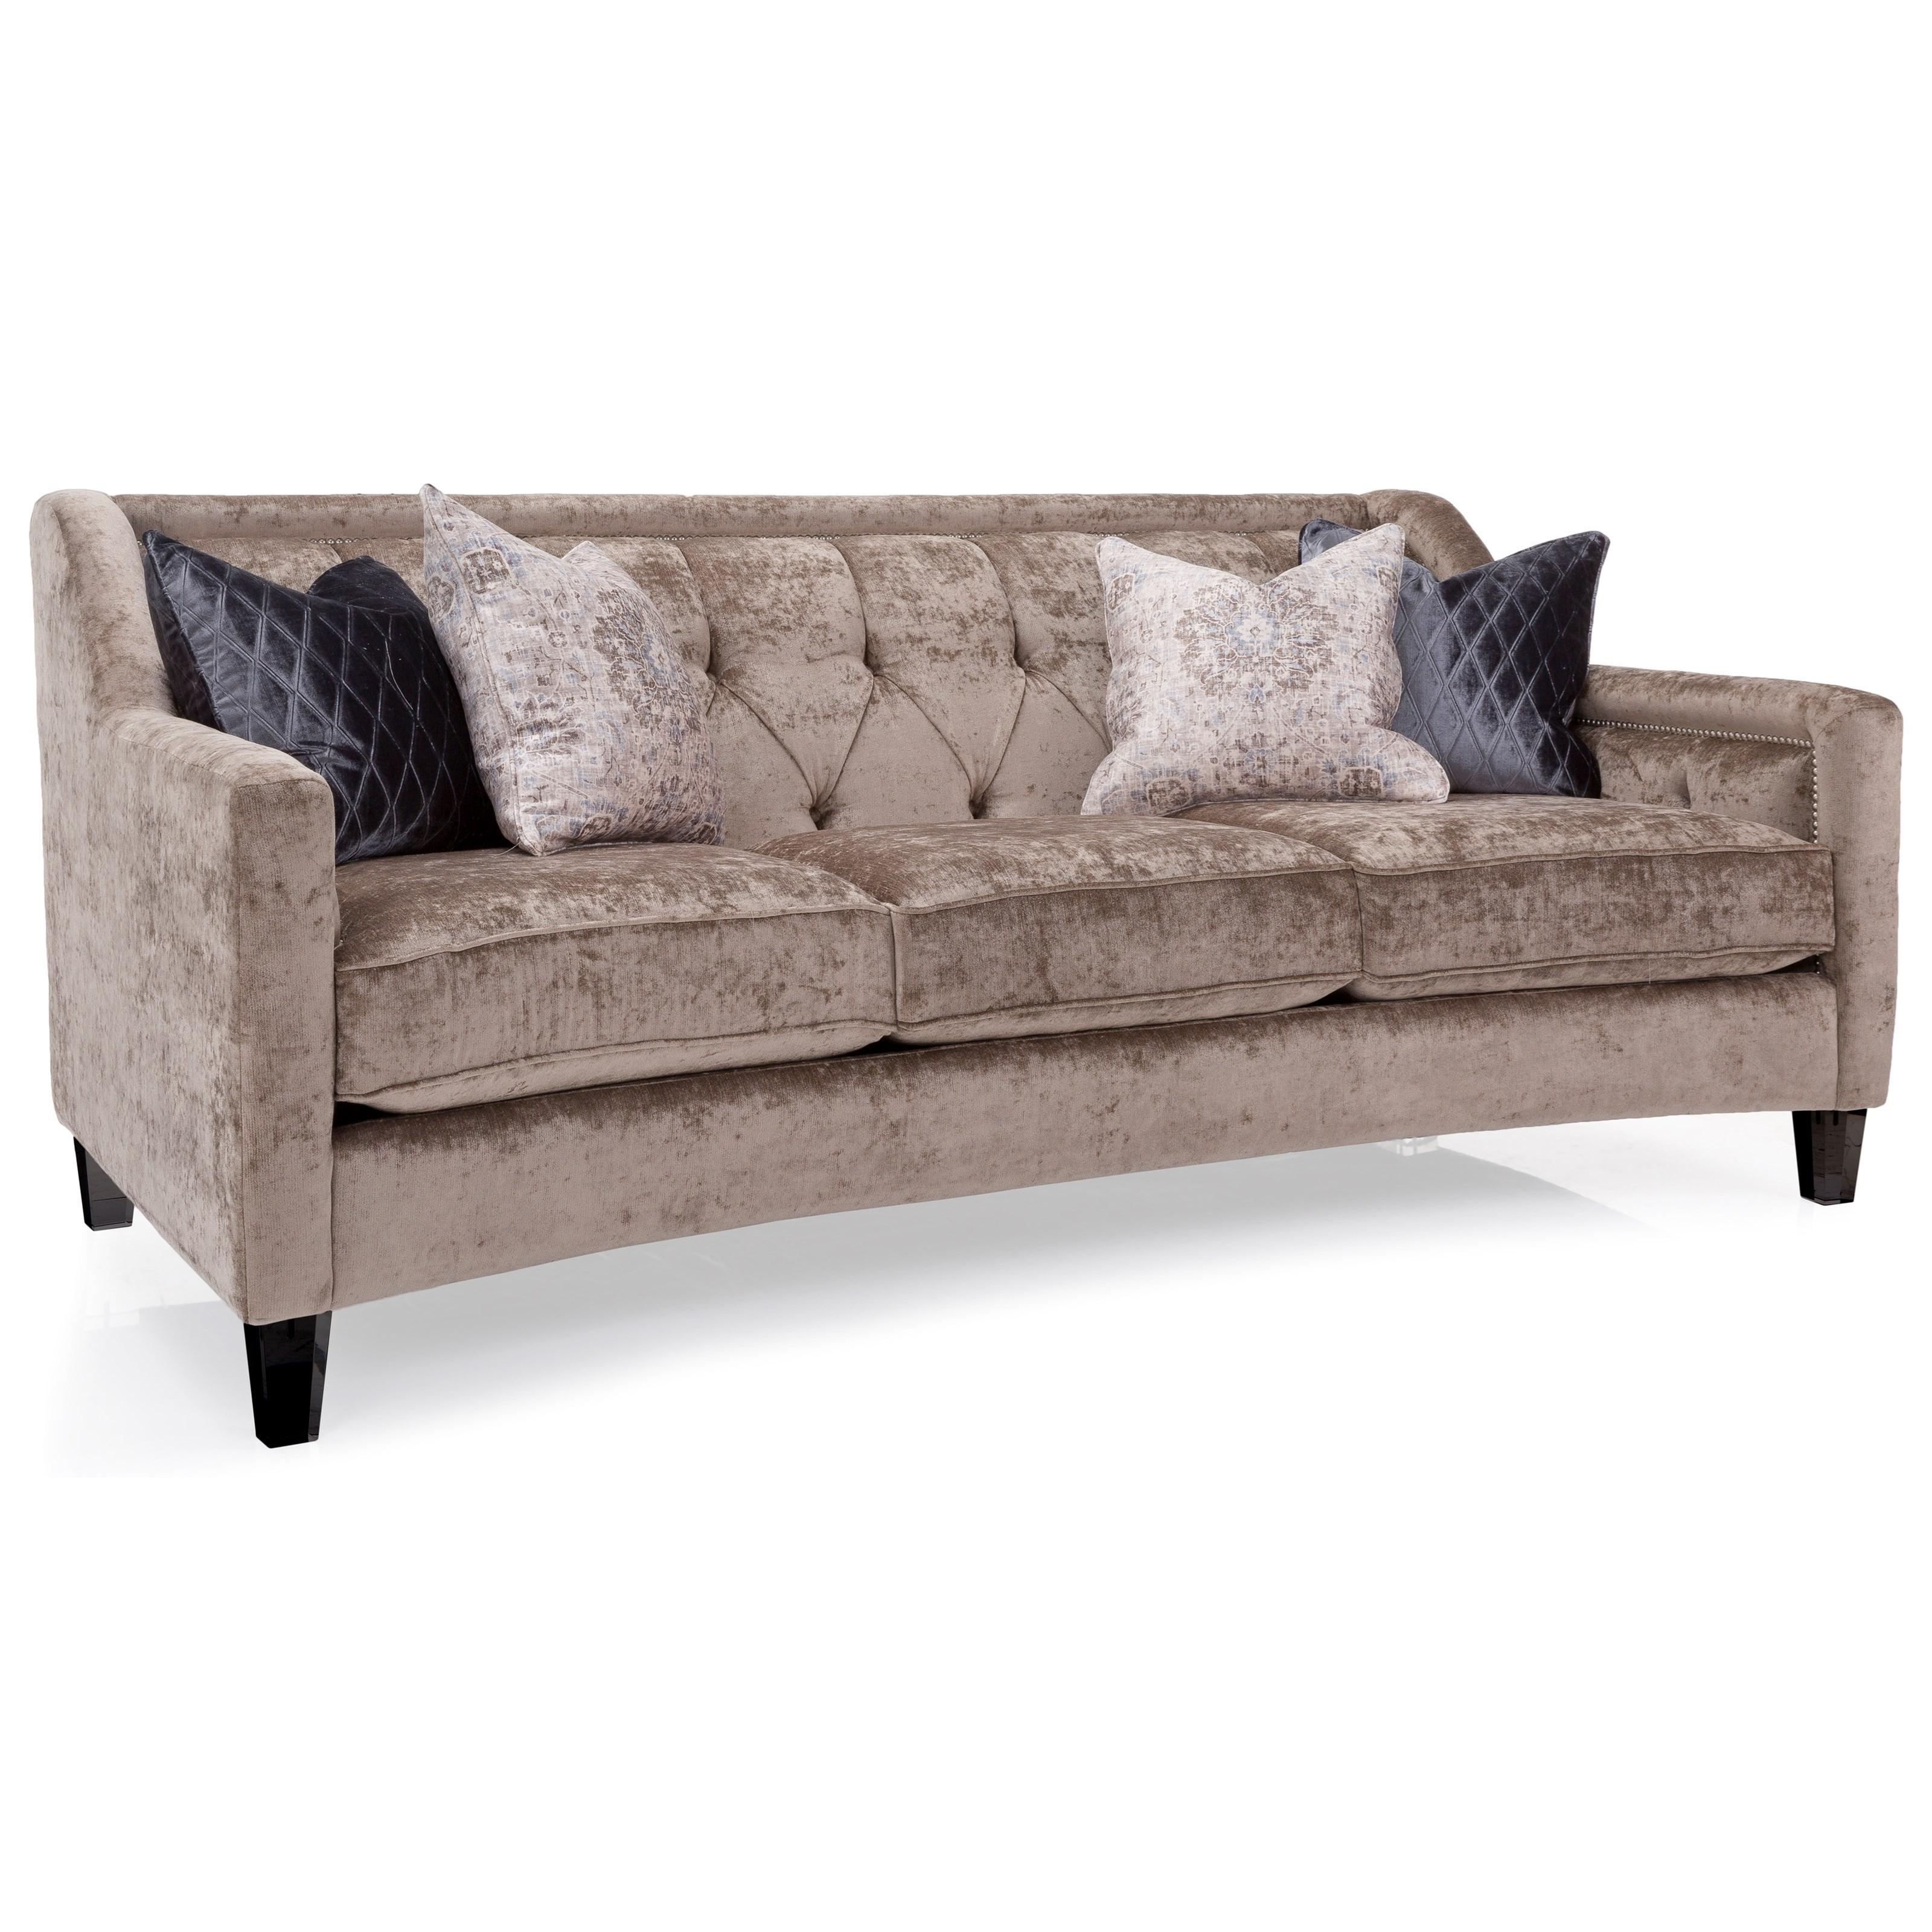 Decor-Rest 2779 Sofa - Item Number: 2779 SOFA-CHAN WOO